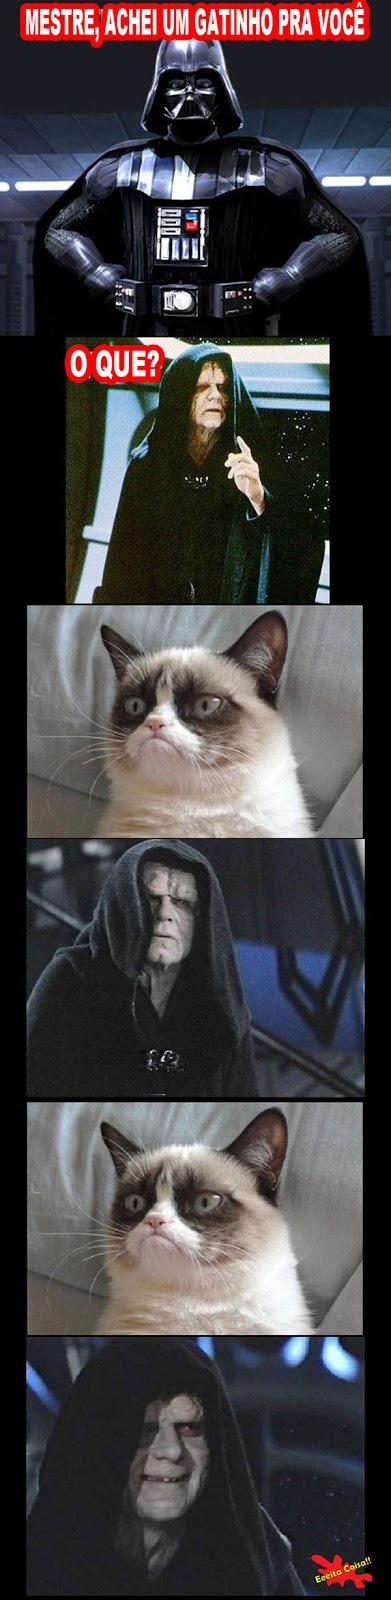 grumpy cat, vader, sidius, star wars, eeeita coisa